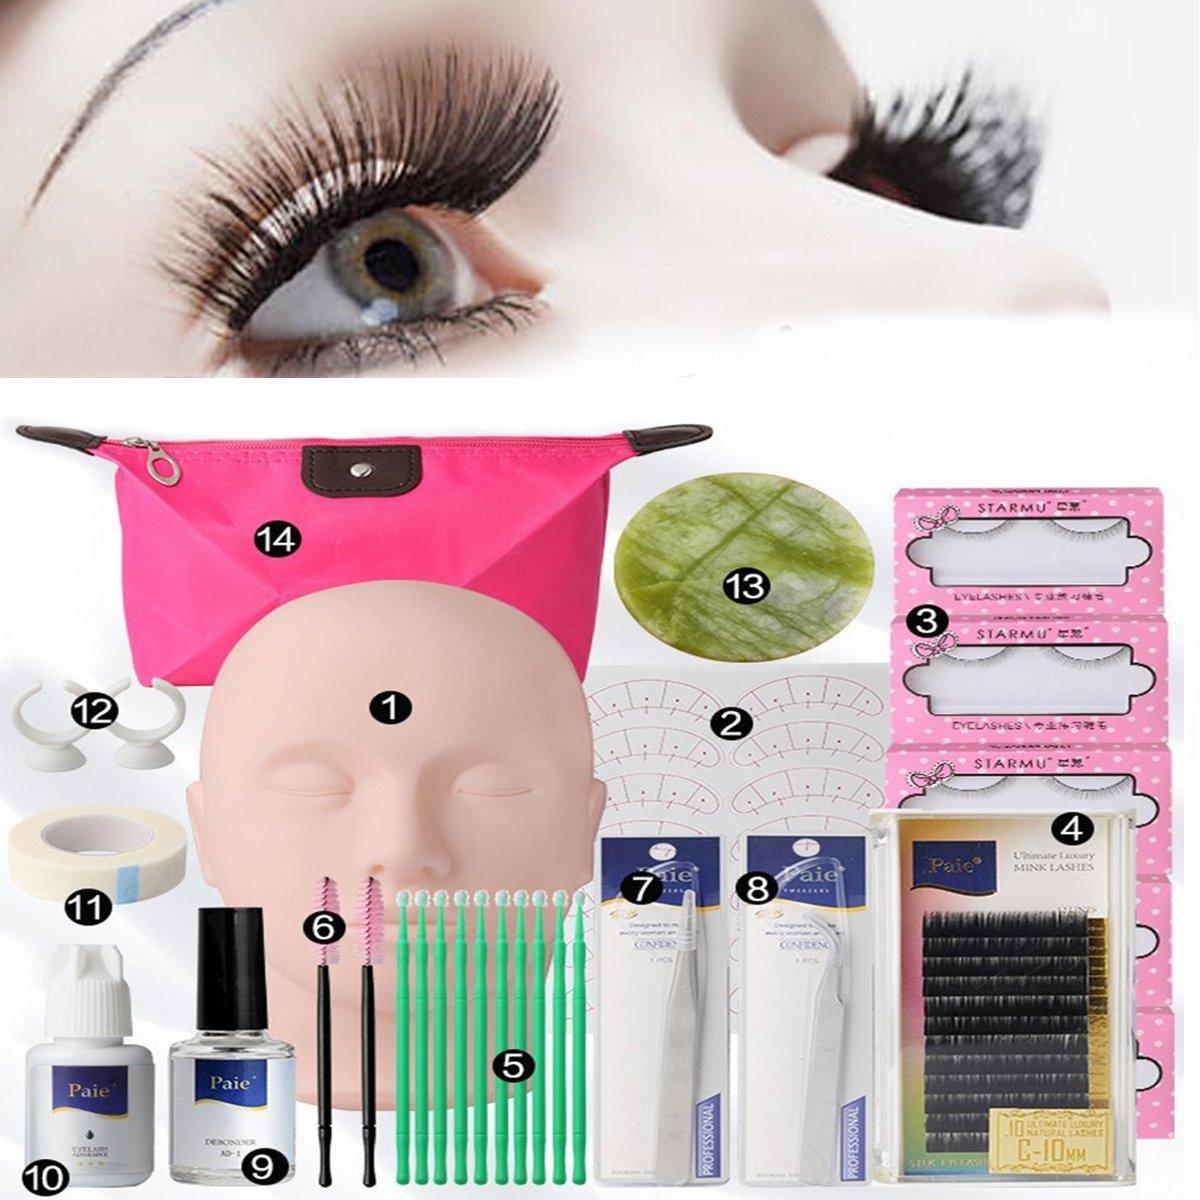 e8d51fe46bf Amazon.com : Careshine Eyelash Extension Kits Set False Lashes Tool Flat  Head Curl Glue With Bag For Makeup practice tools : Beauty